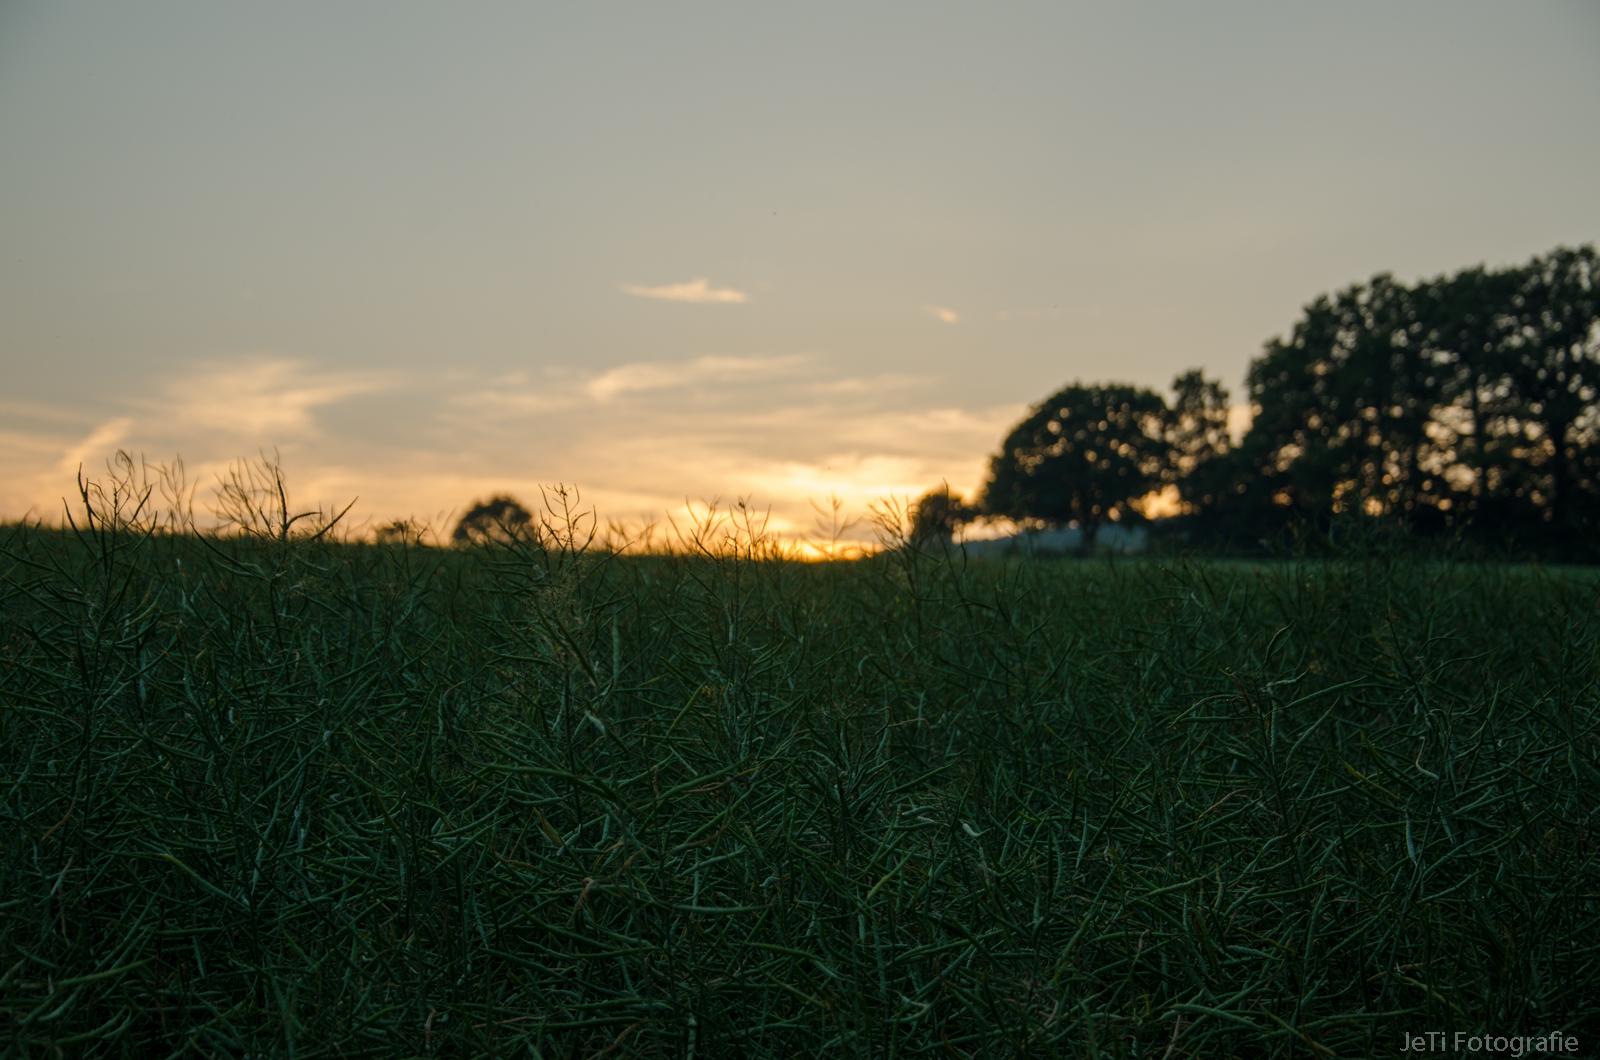 Abend Landschaft II